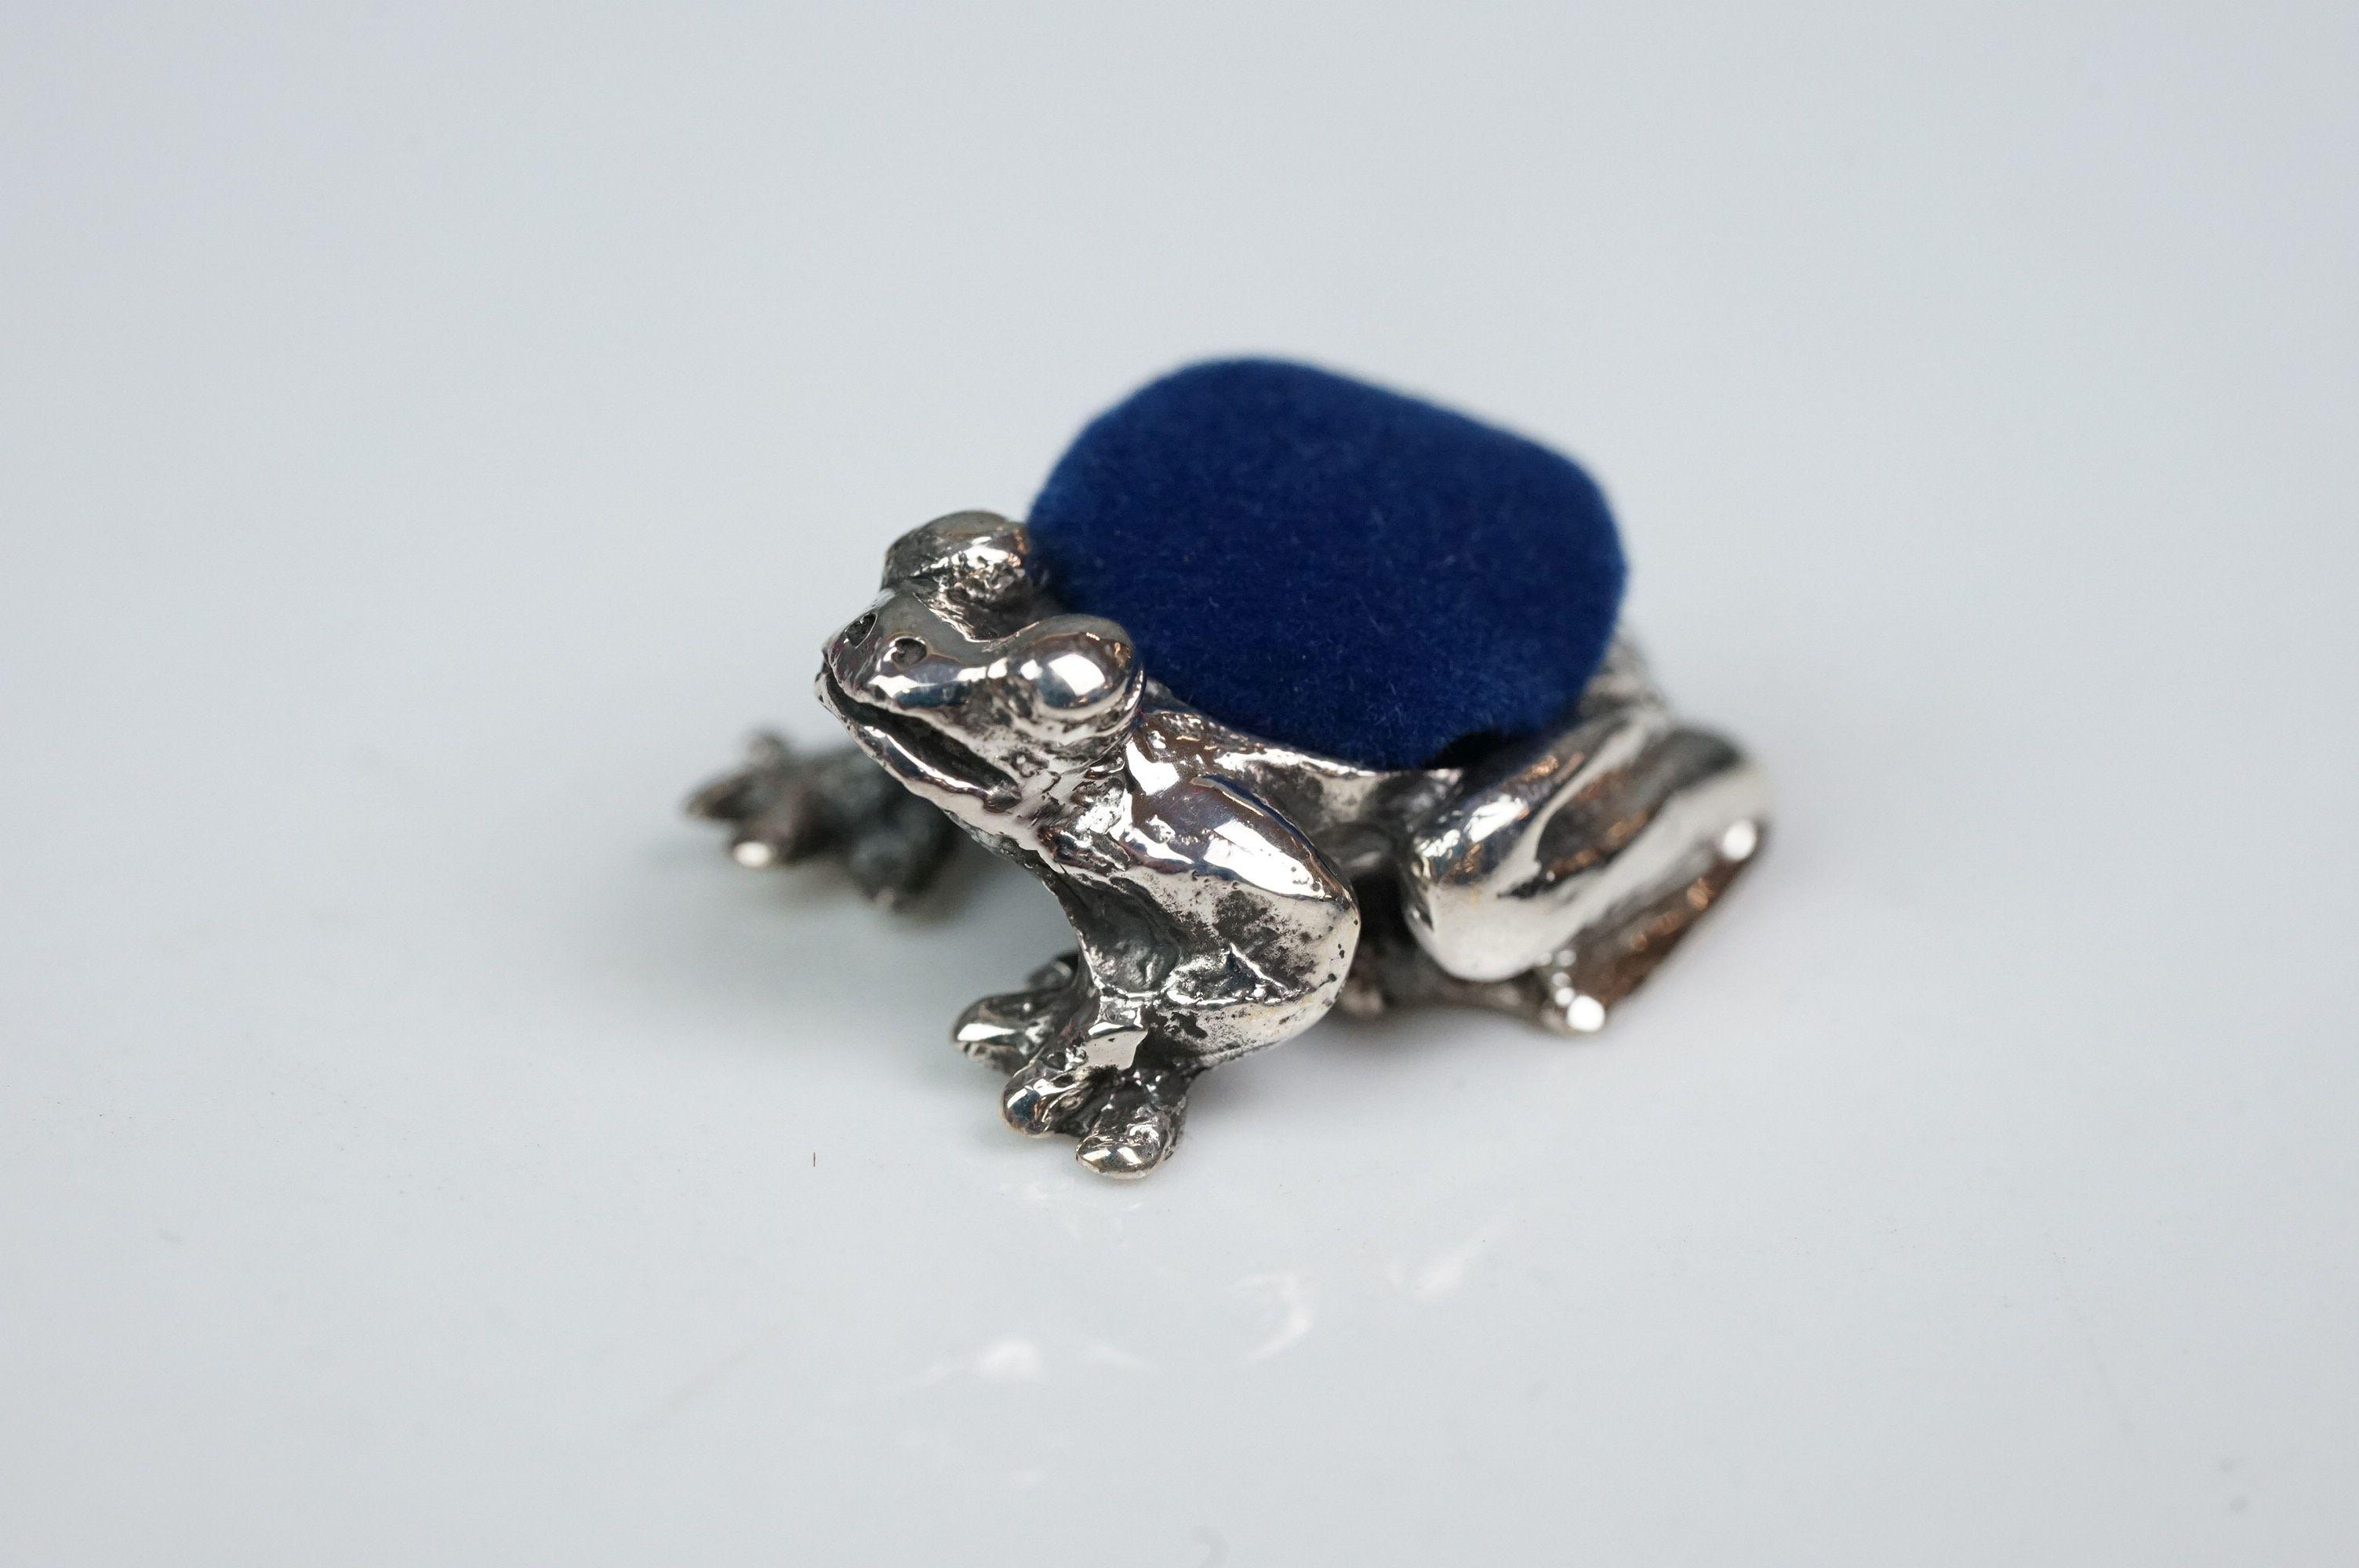 Silver frog pincushion